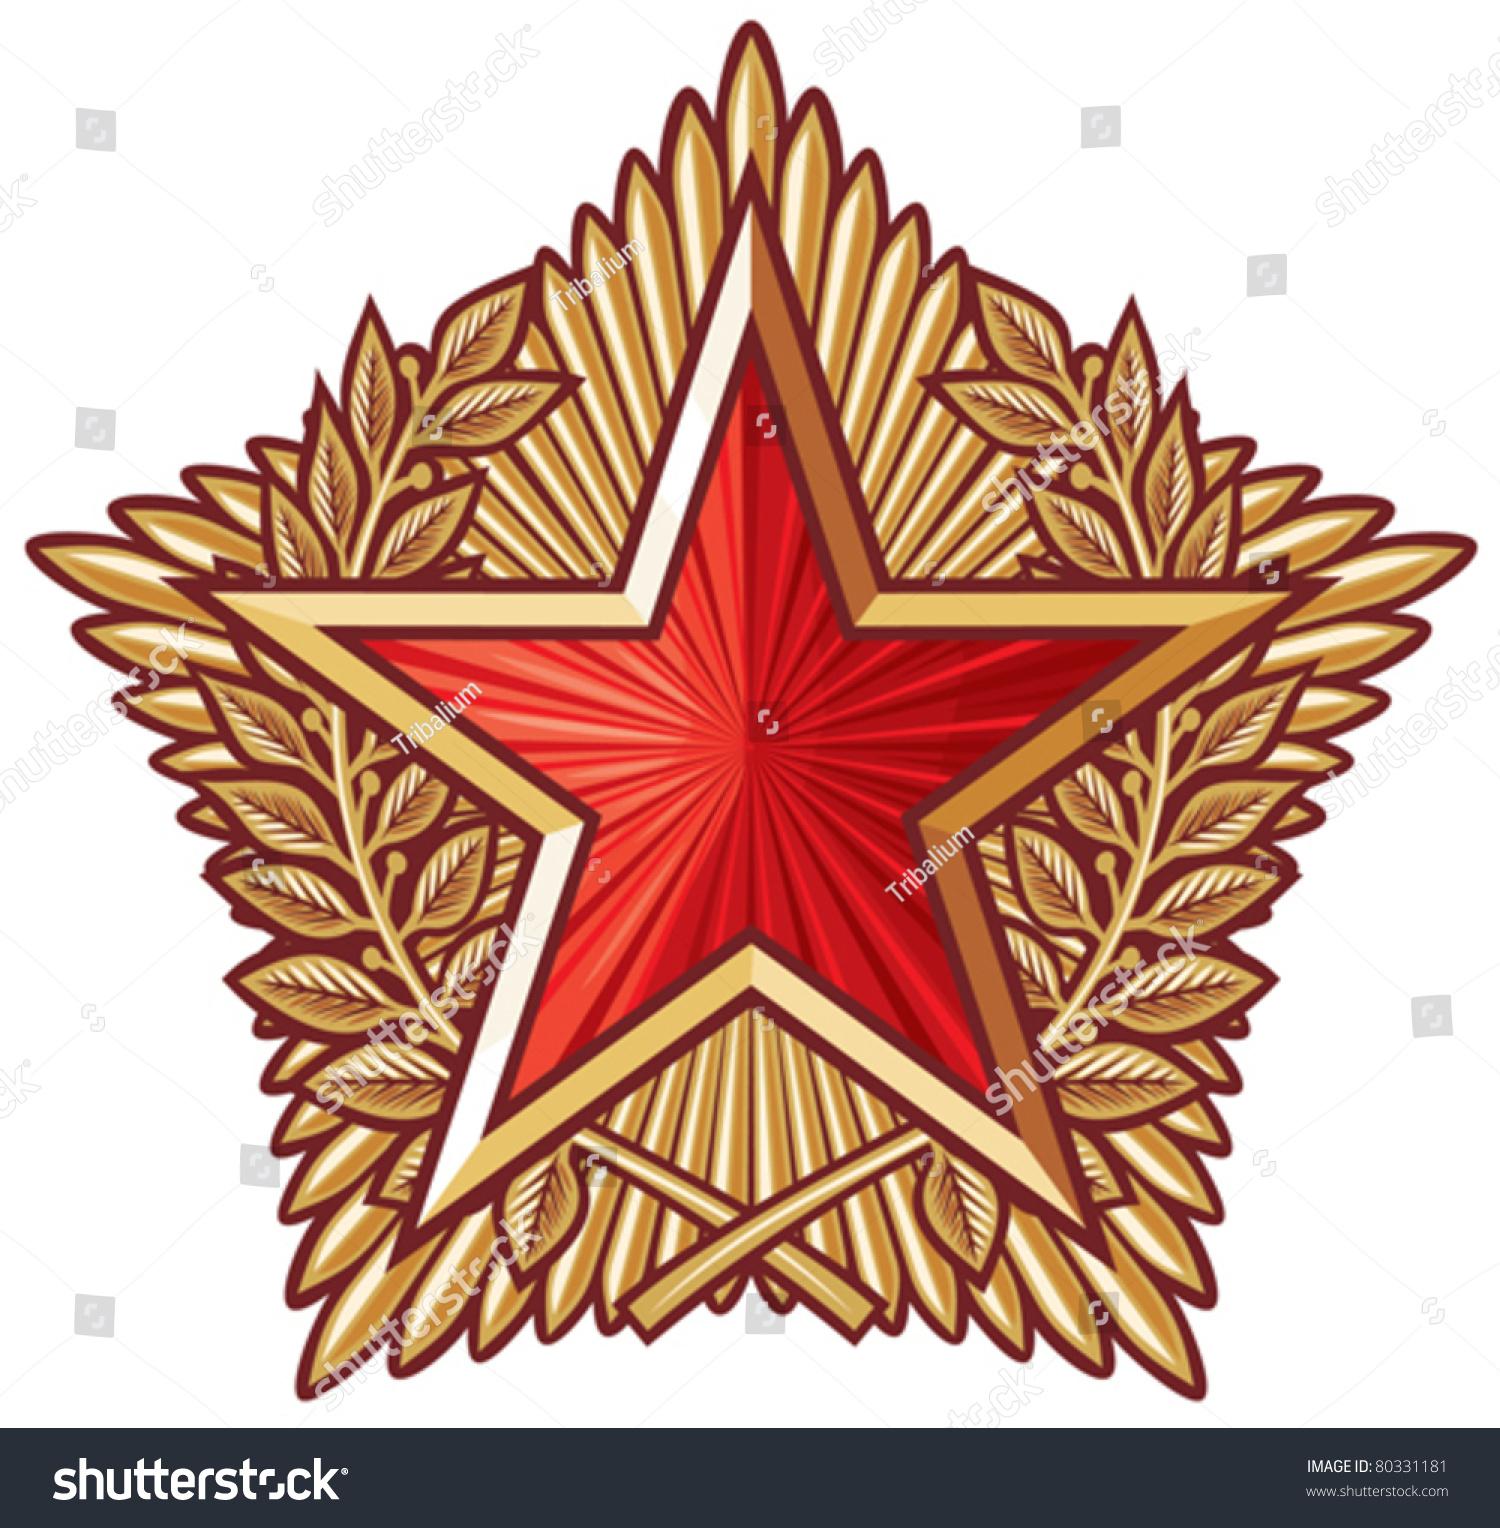 Soviet Ussr Star Laurel Wreath Stock Vector 81972445 - Shutterstock